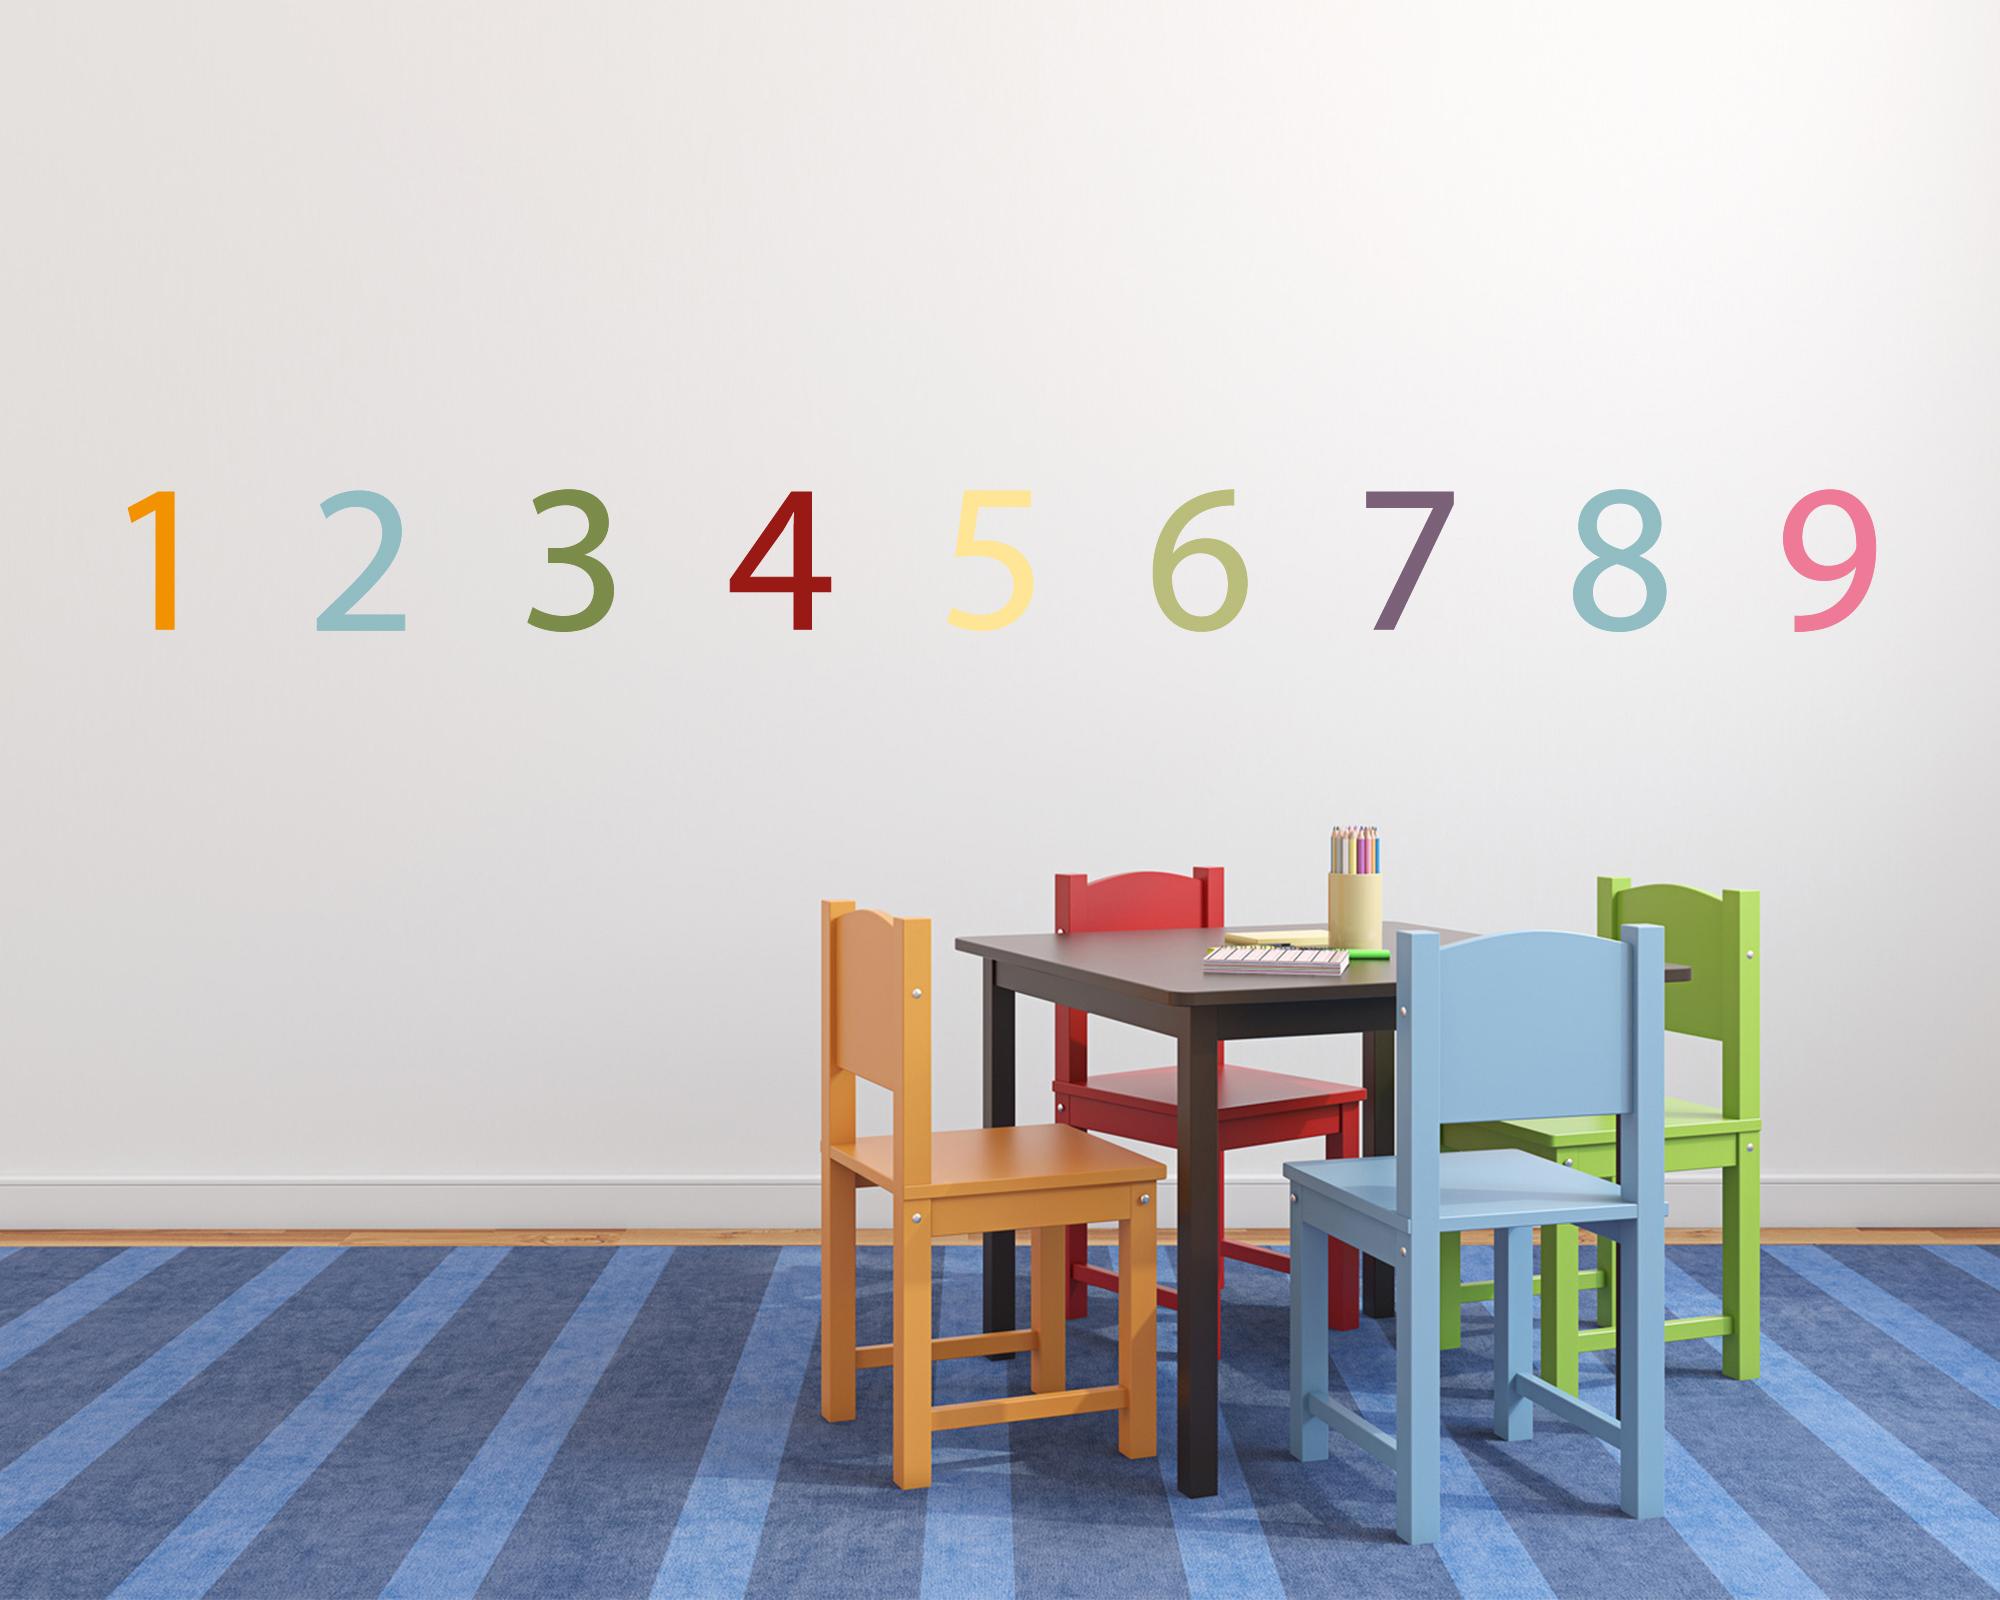 Full Size of Stickerset Zahlen Bunte Wanddeko Fr Das Kinderzimmer Sofa Küche Regal Regale Weiß Kinderzimmer Kinderzimmer Wanddeko